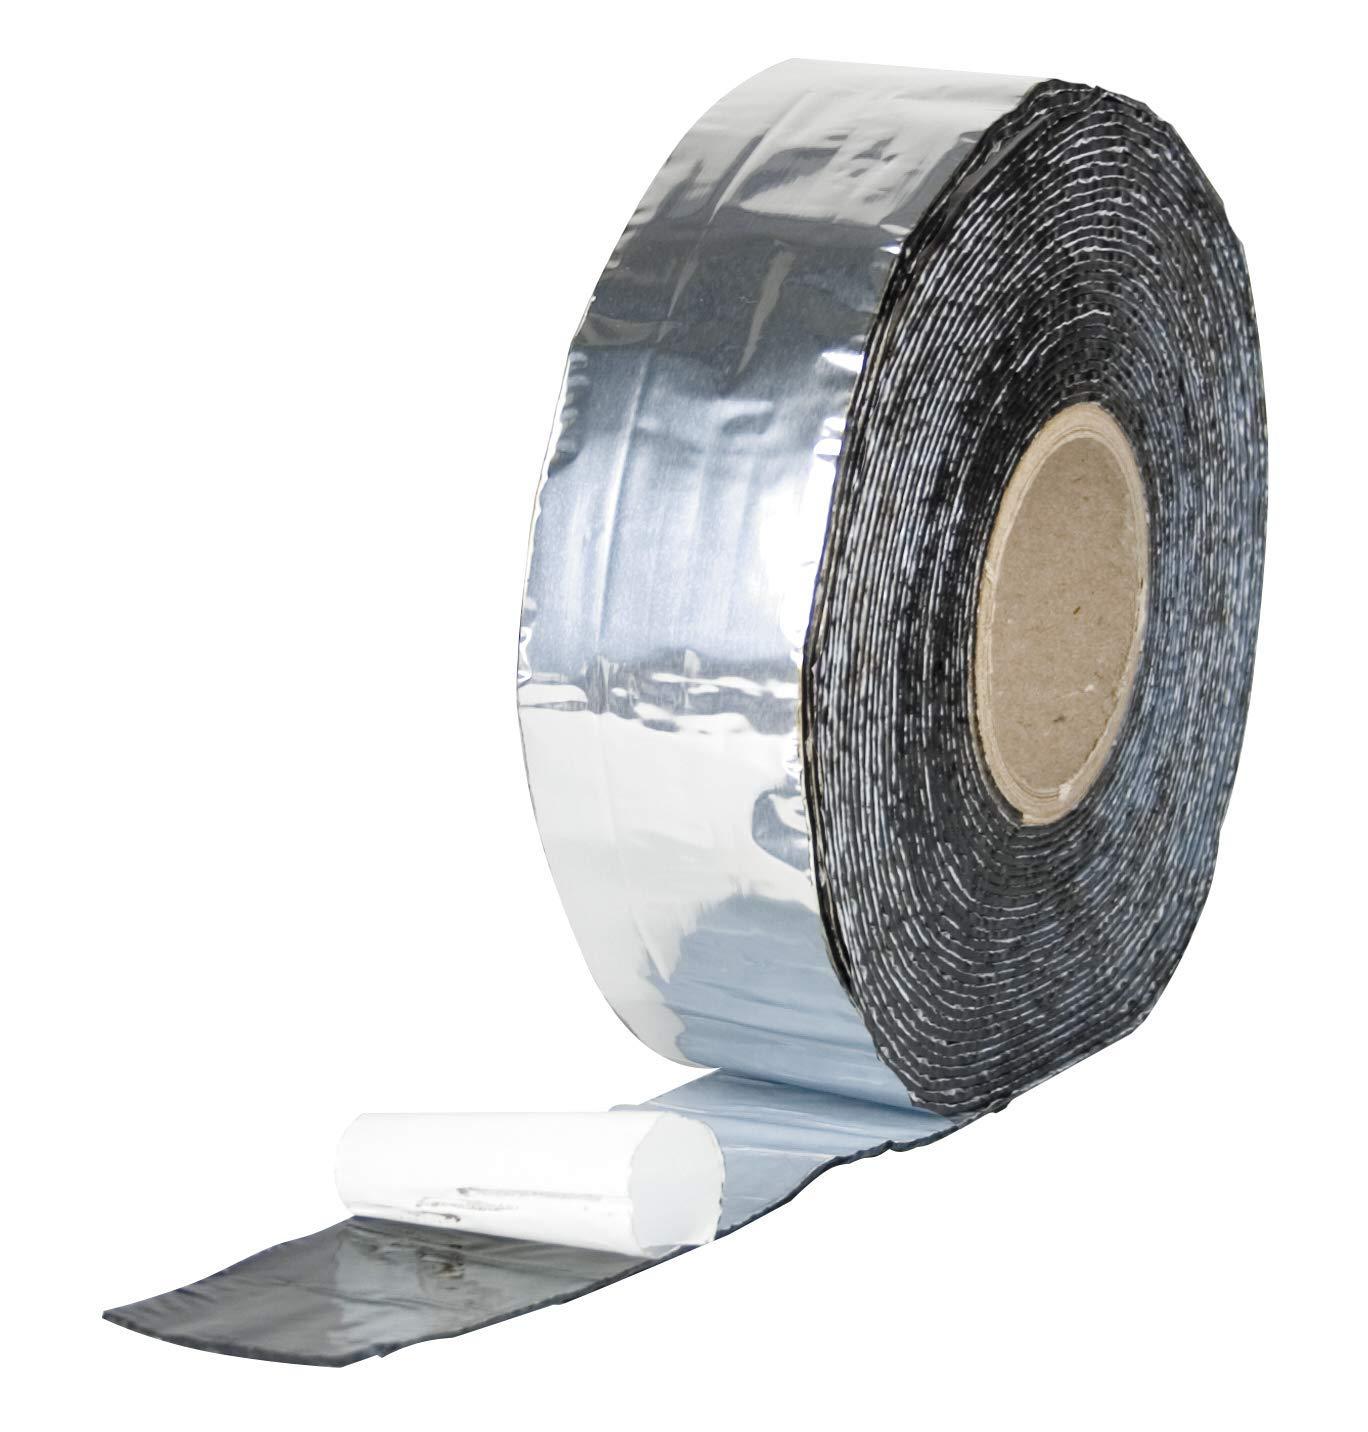 Beko BT Ruban adh/ésif Aluminium 300 mm x 10 m Aluminium argent/é